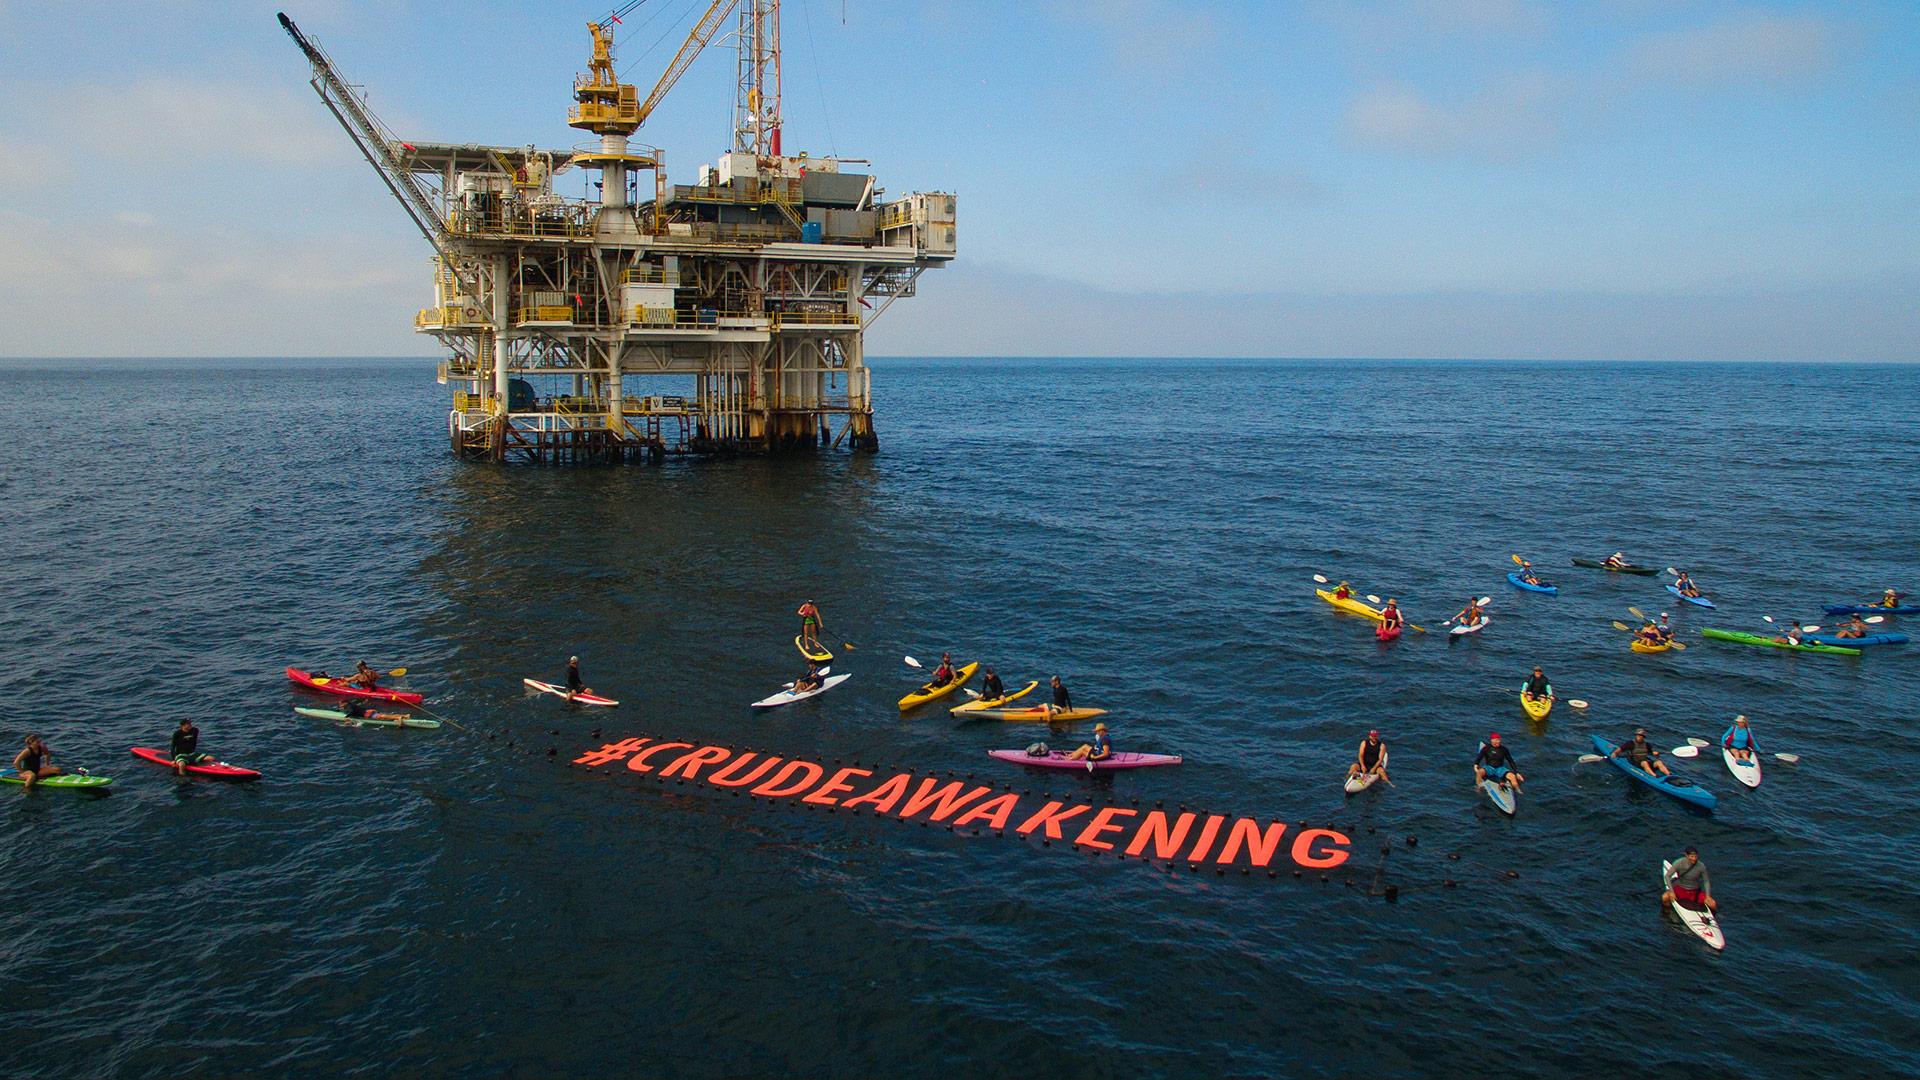 Patagonia y #crudeawakening para salvar el Planeta